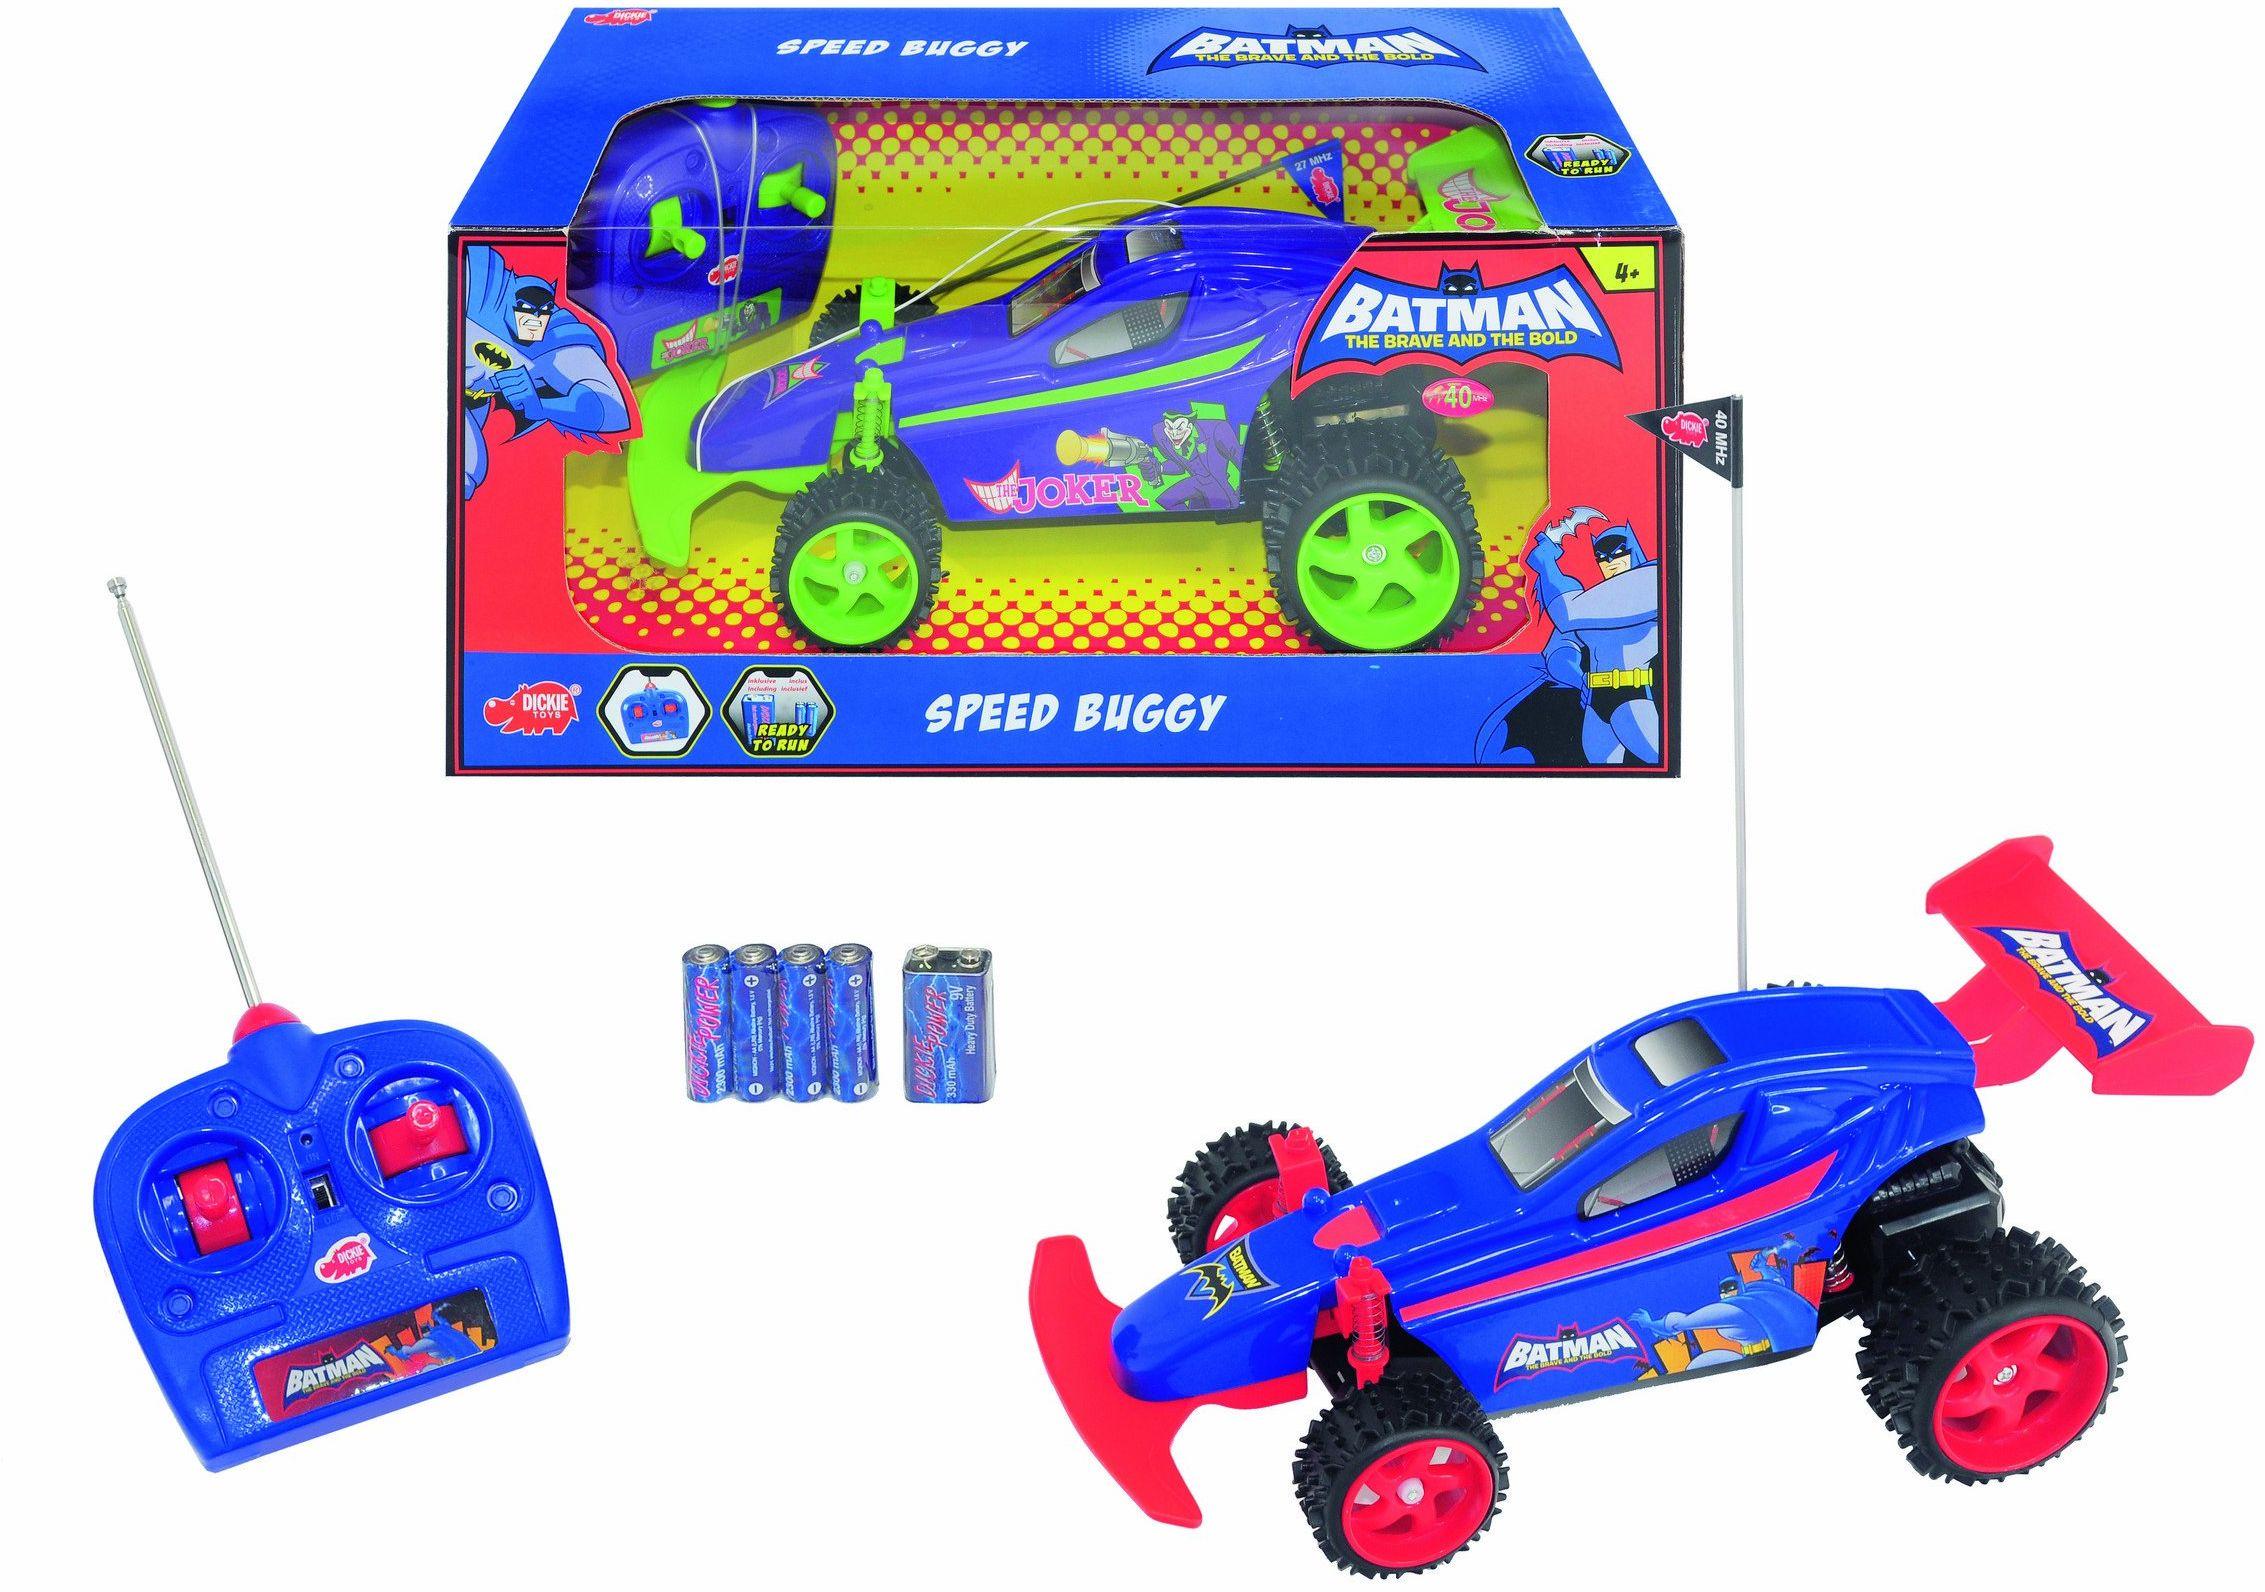 Simba-Smoby Batman R/C Speed Buggy